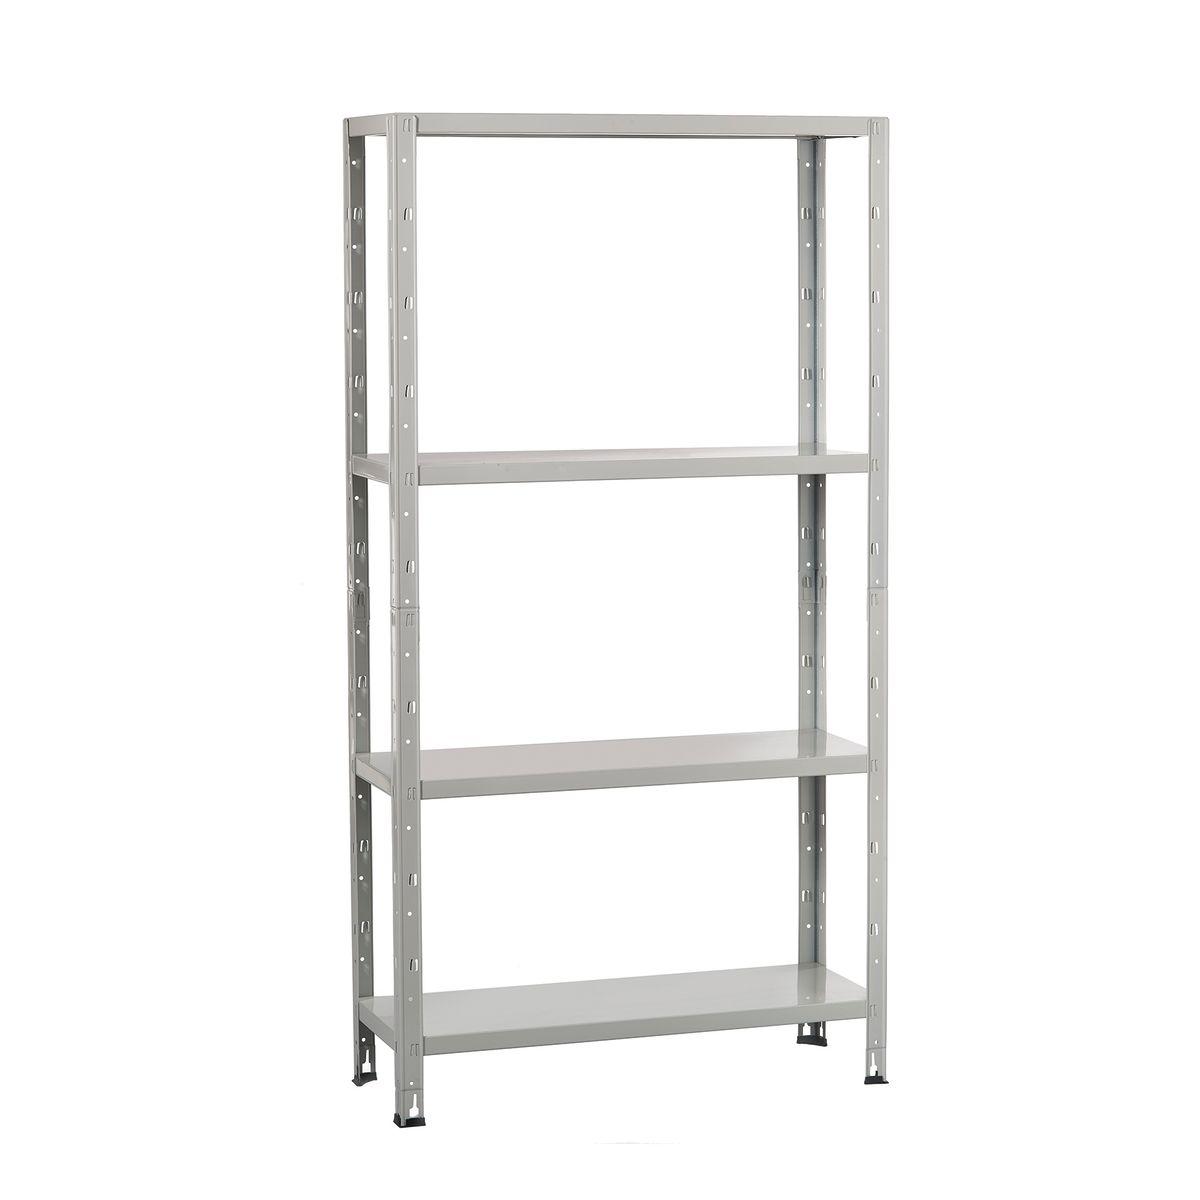 Amaca autoportante ikea for Ikea scaffali in metallo